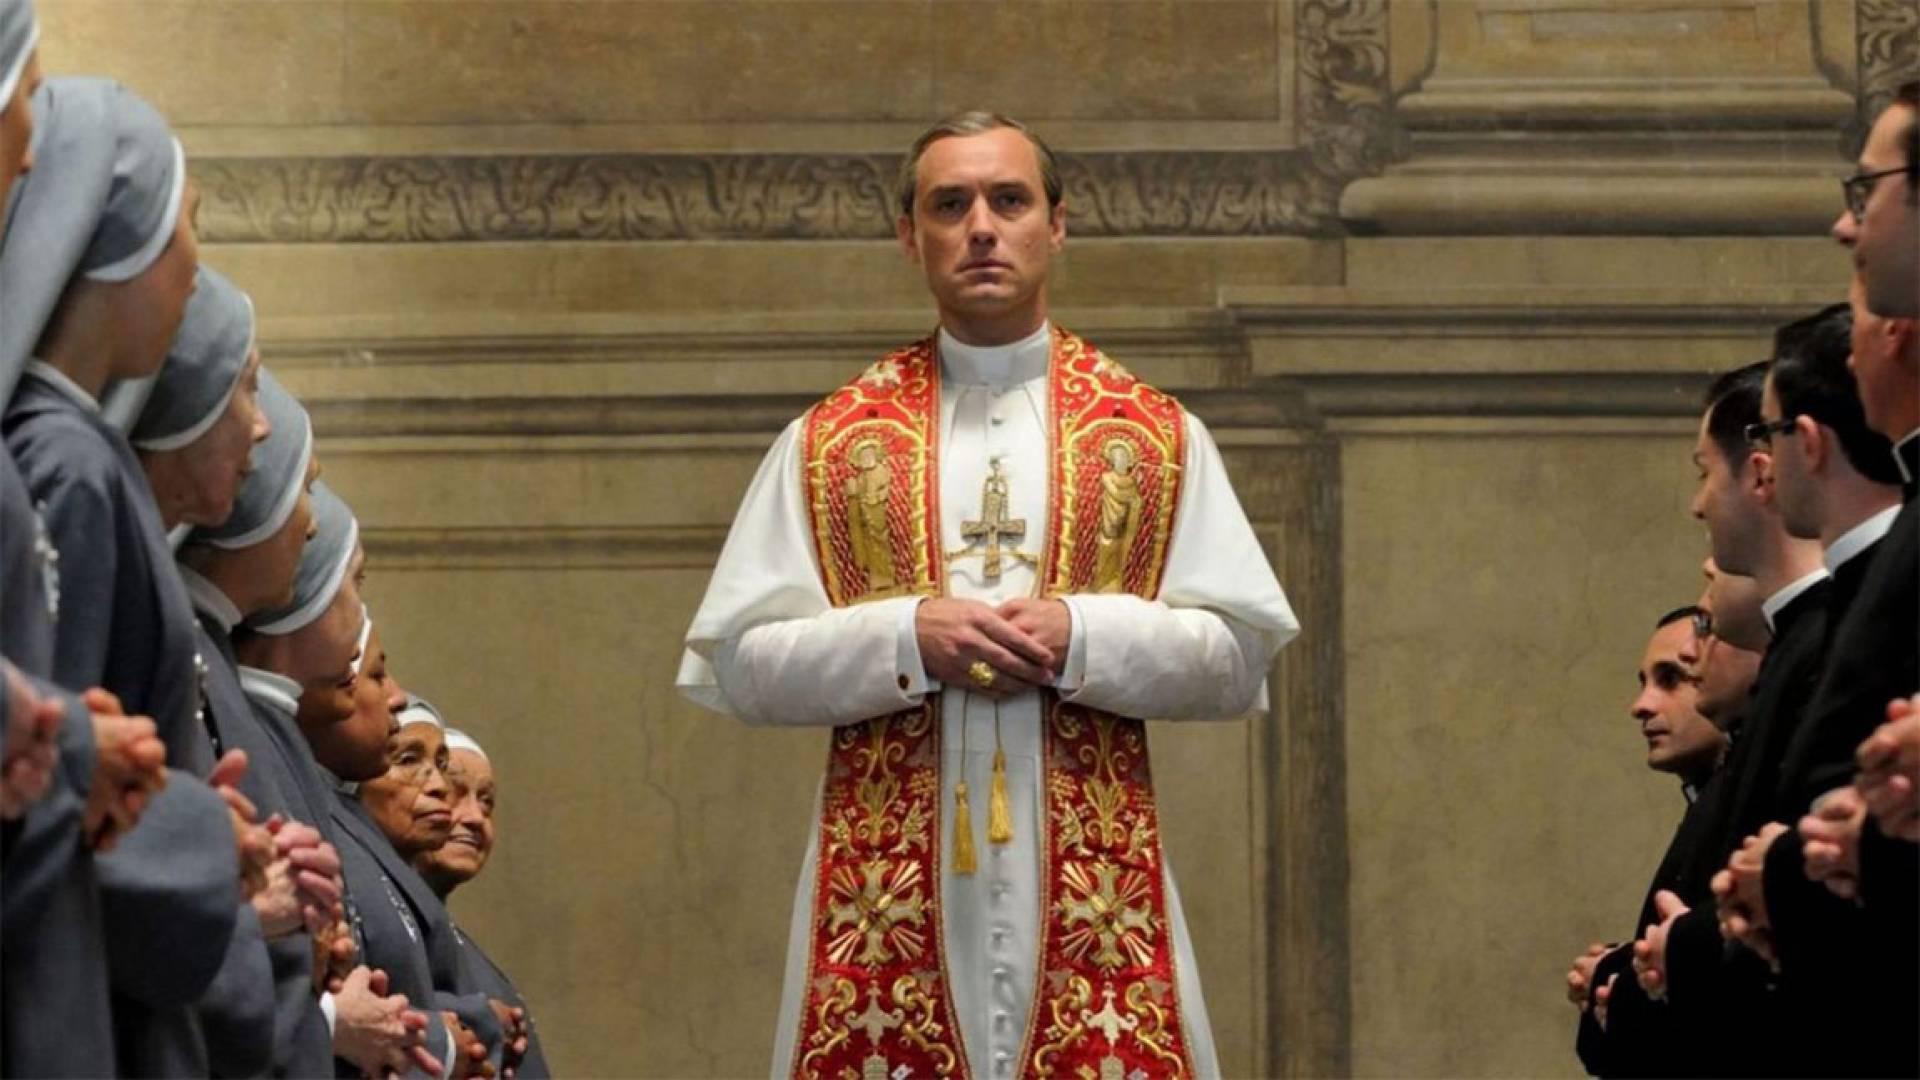 Los Van God #7: Het 'cv Of Failure', Jude Law Als Paus En Christelijk Chauvinisme